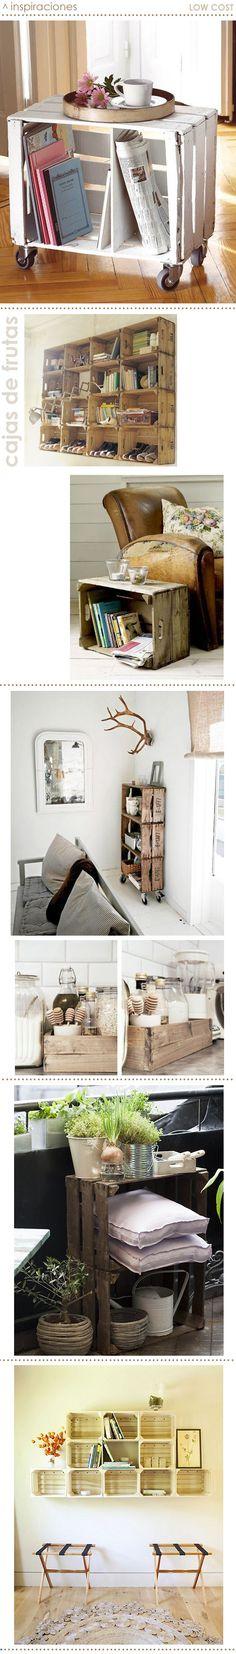 Source: http://www.tres-studio-blog.com/2012/05/decoracion-low-cost-hazlo-tu-cajas-de.html